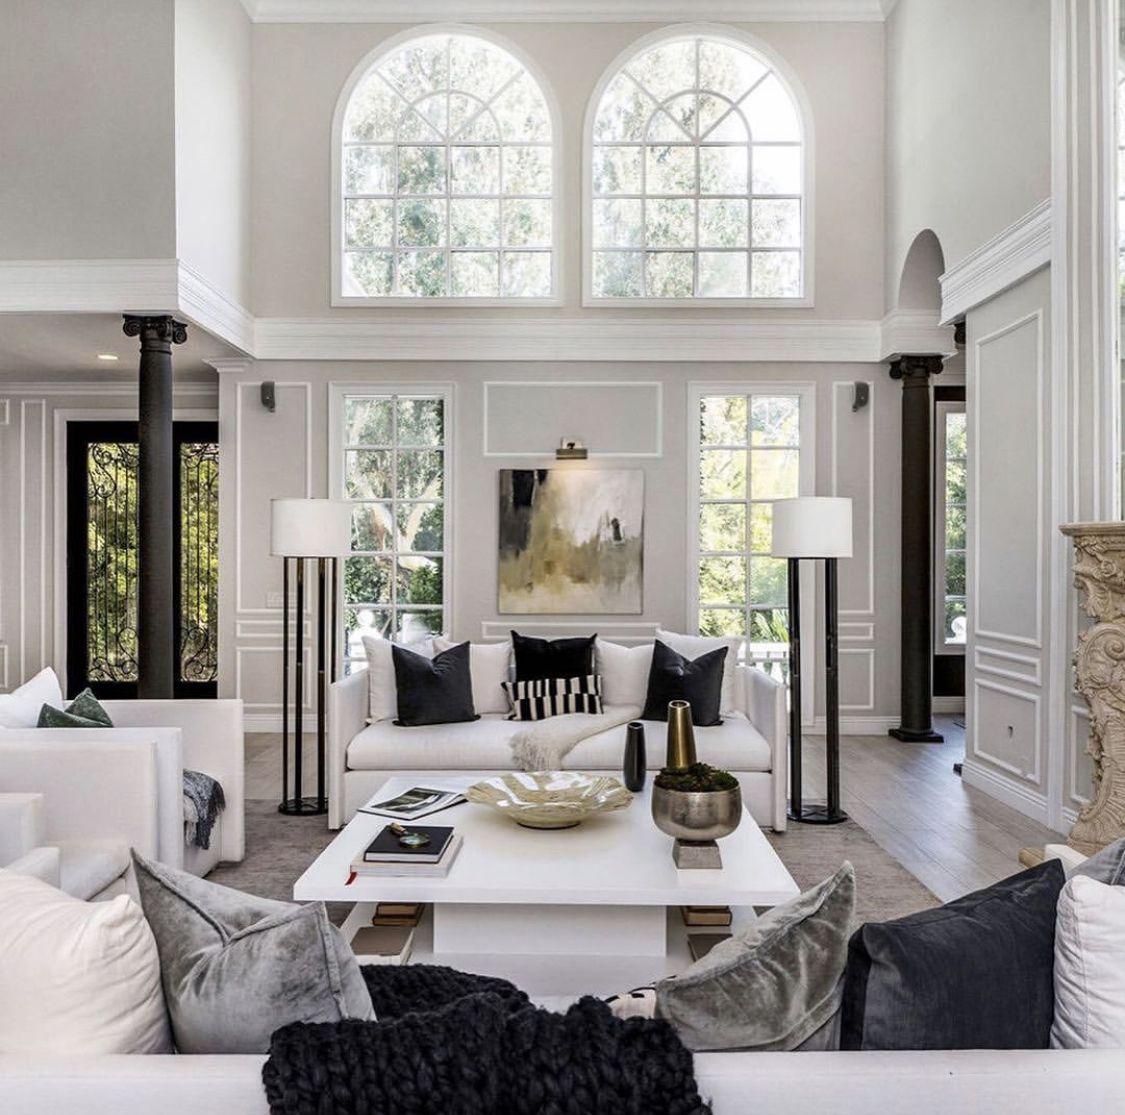 Pin By Hongman Lee On Black White Living Mobile Home Living Luxury Remodel Home Million dollar homes living rooms